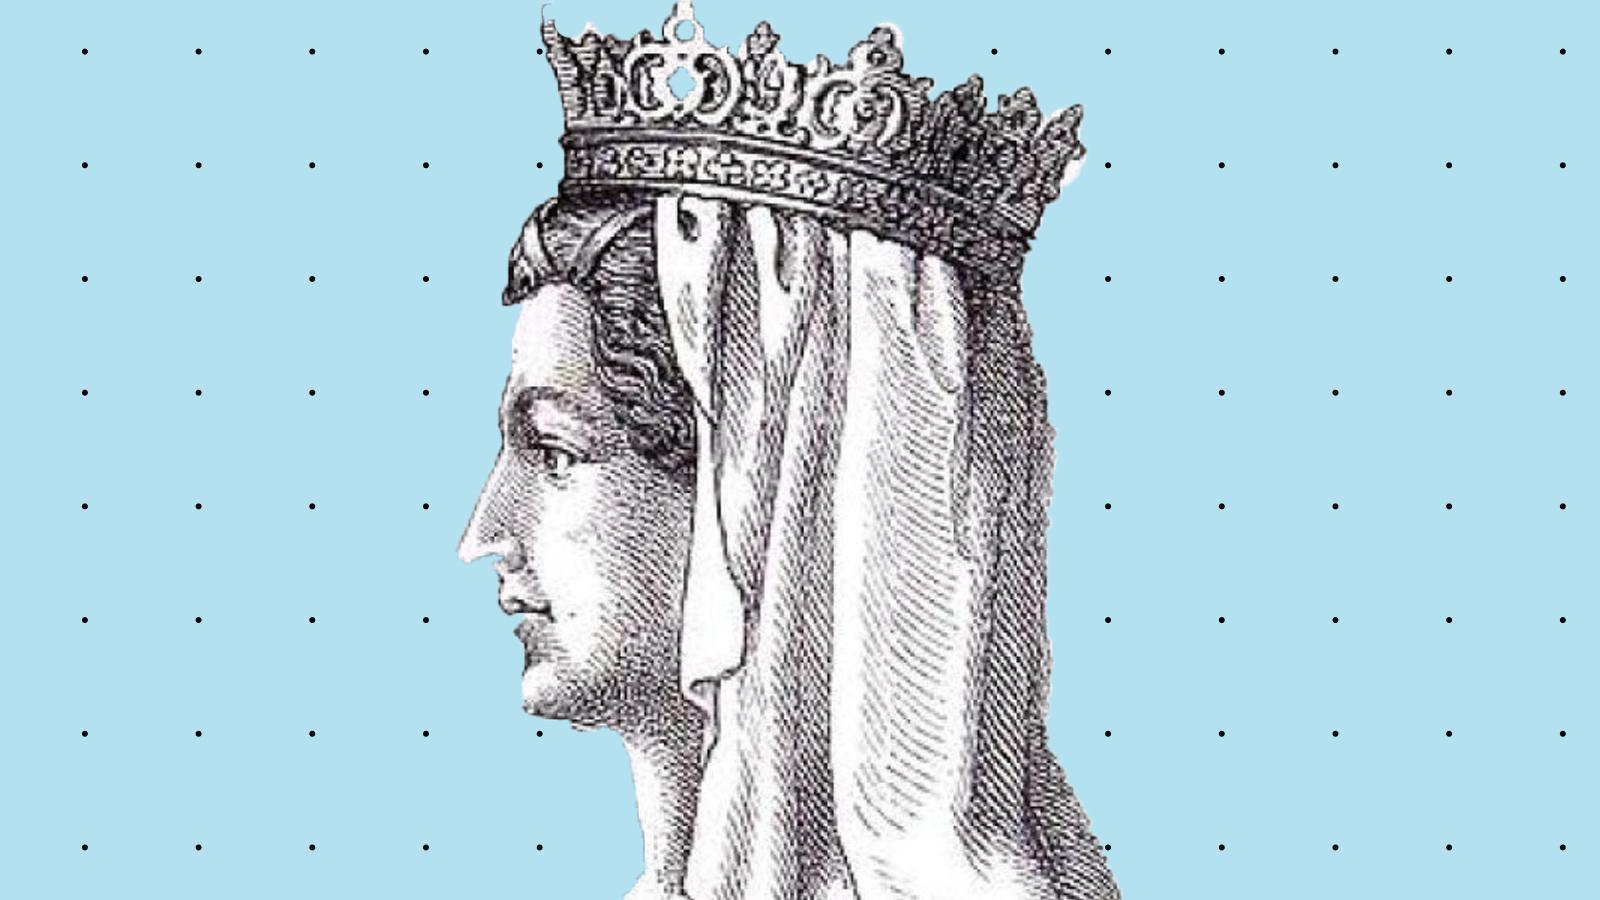 dronning.jpg